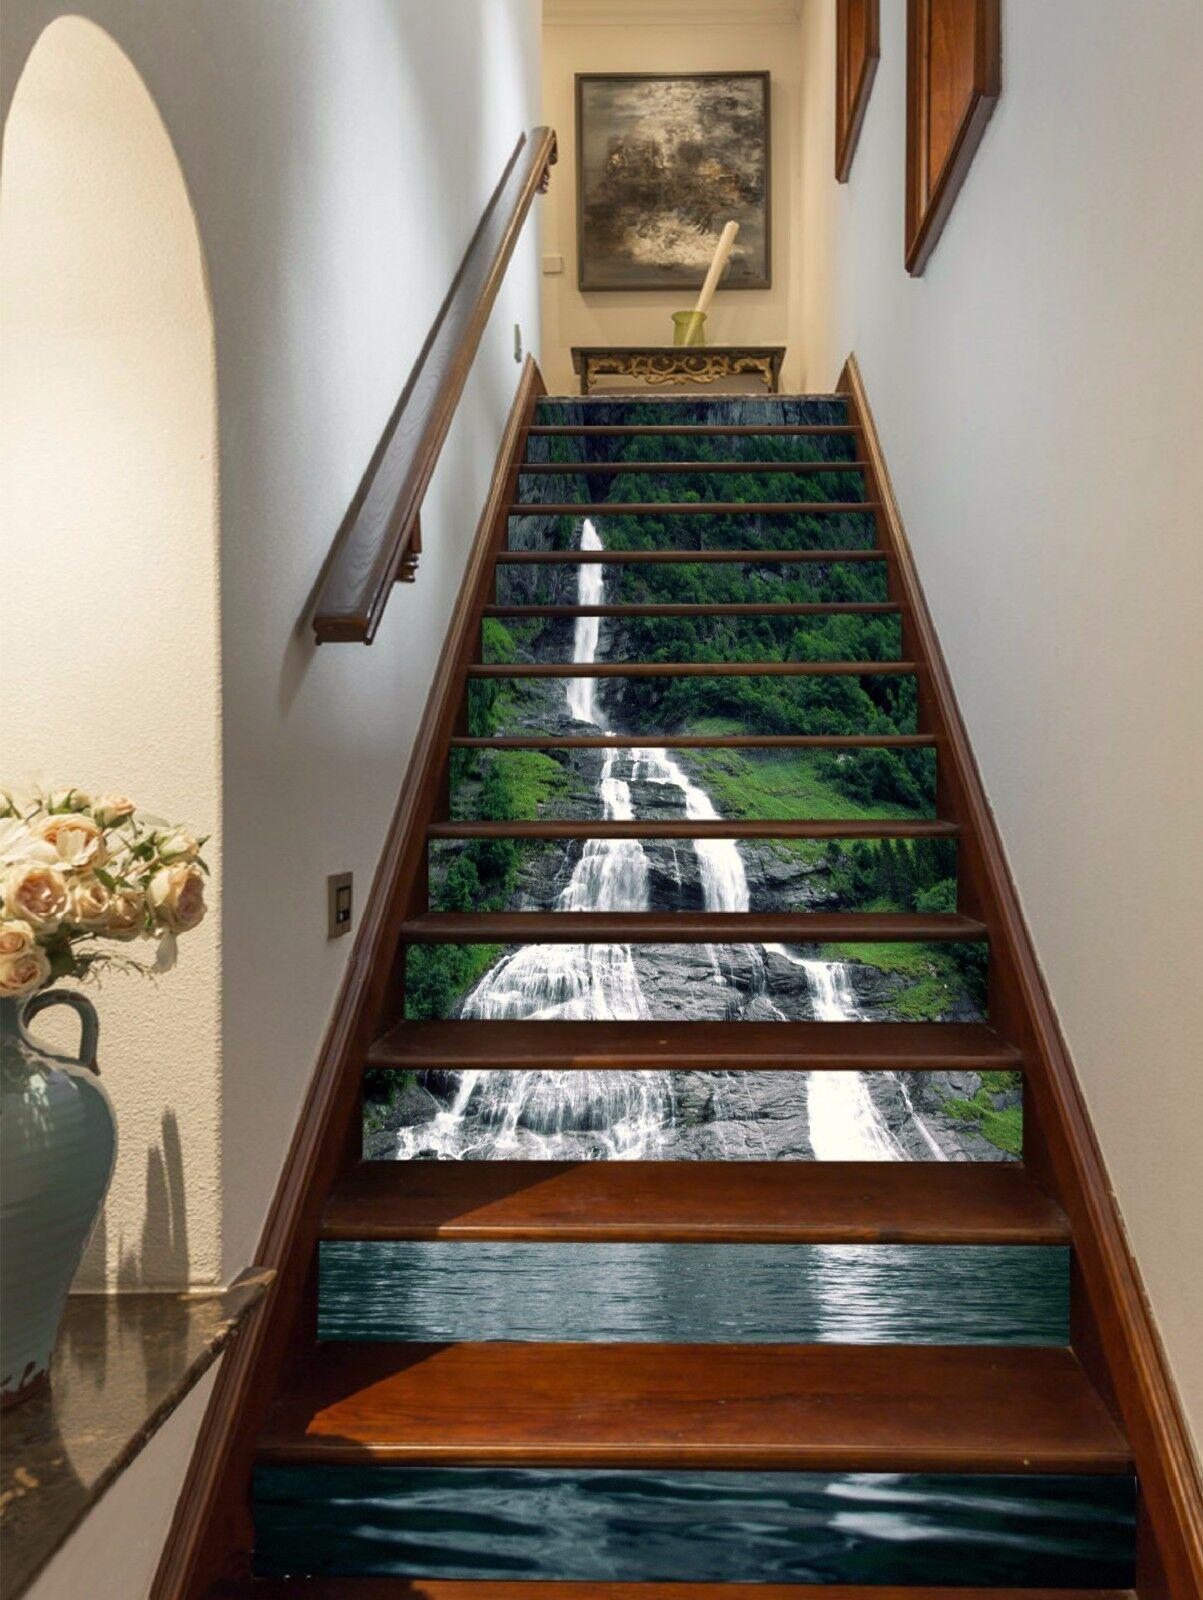 3D Slim Falls 148 Stair Risers Decoration Photo Mural Vinyl Decal WandPapier AU